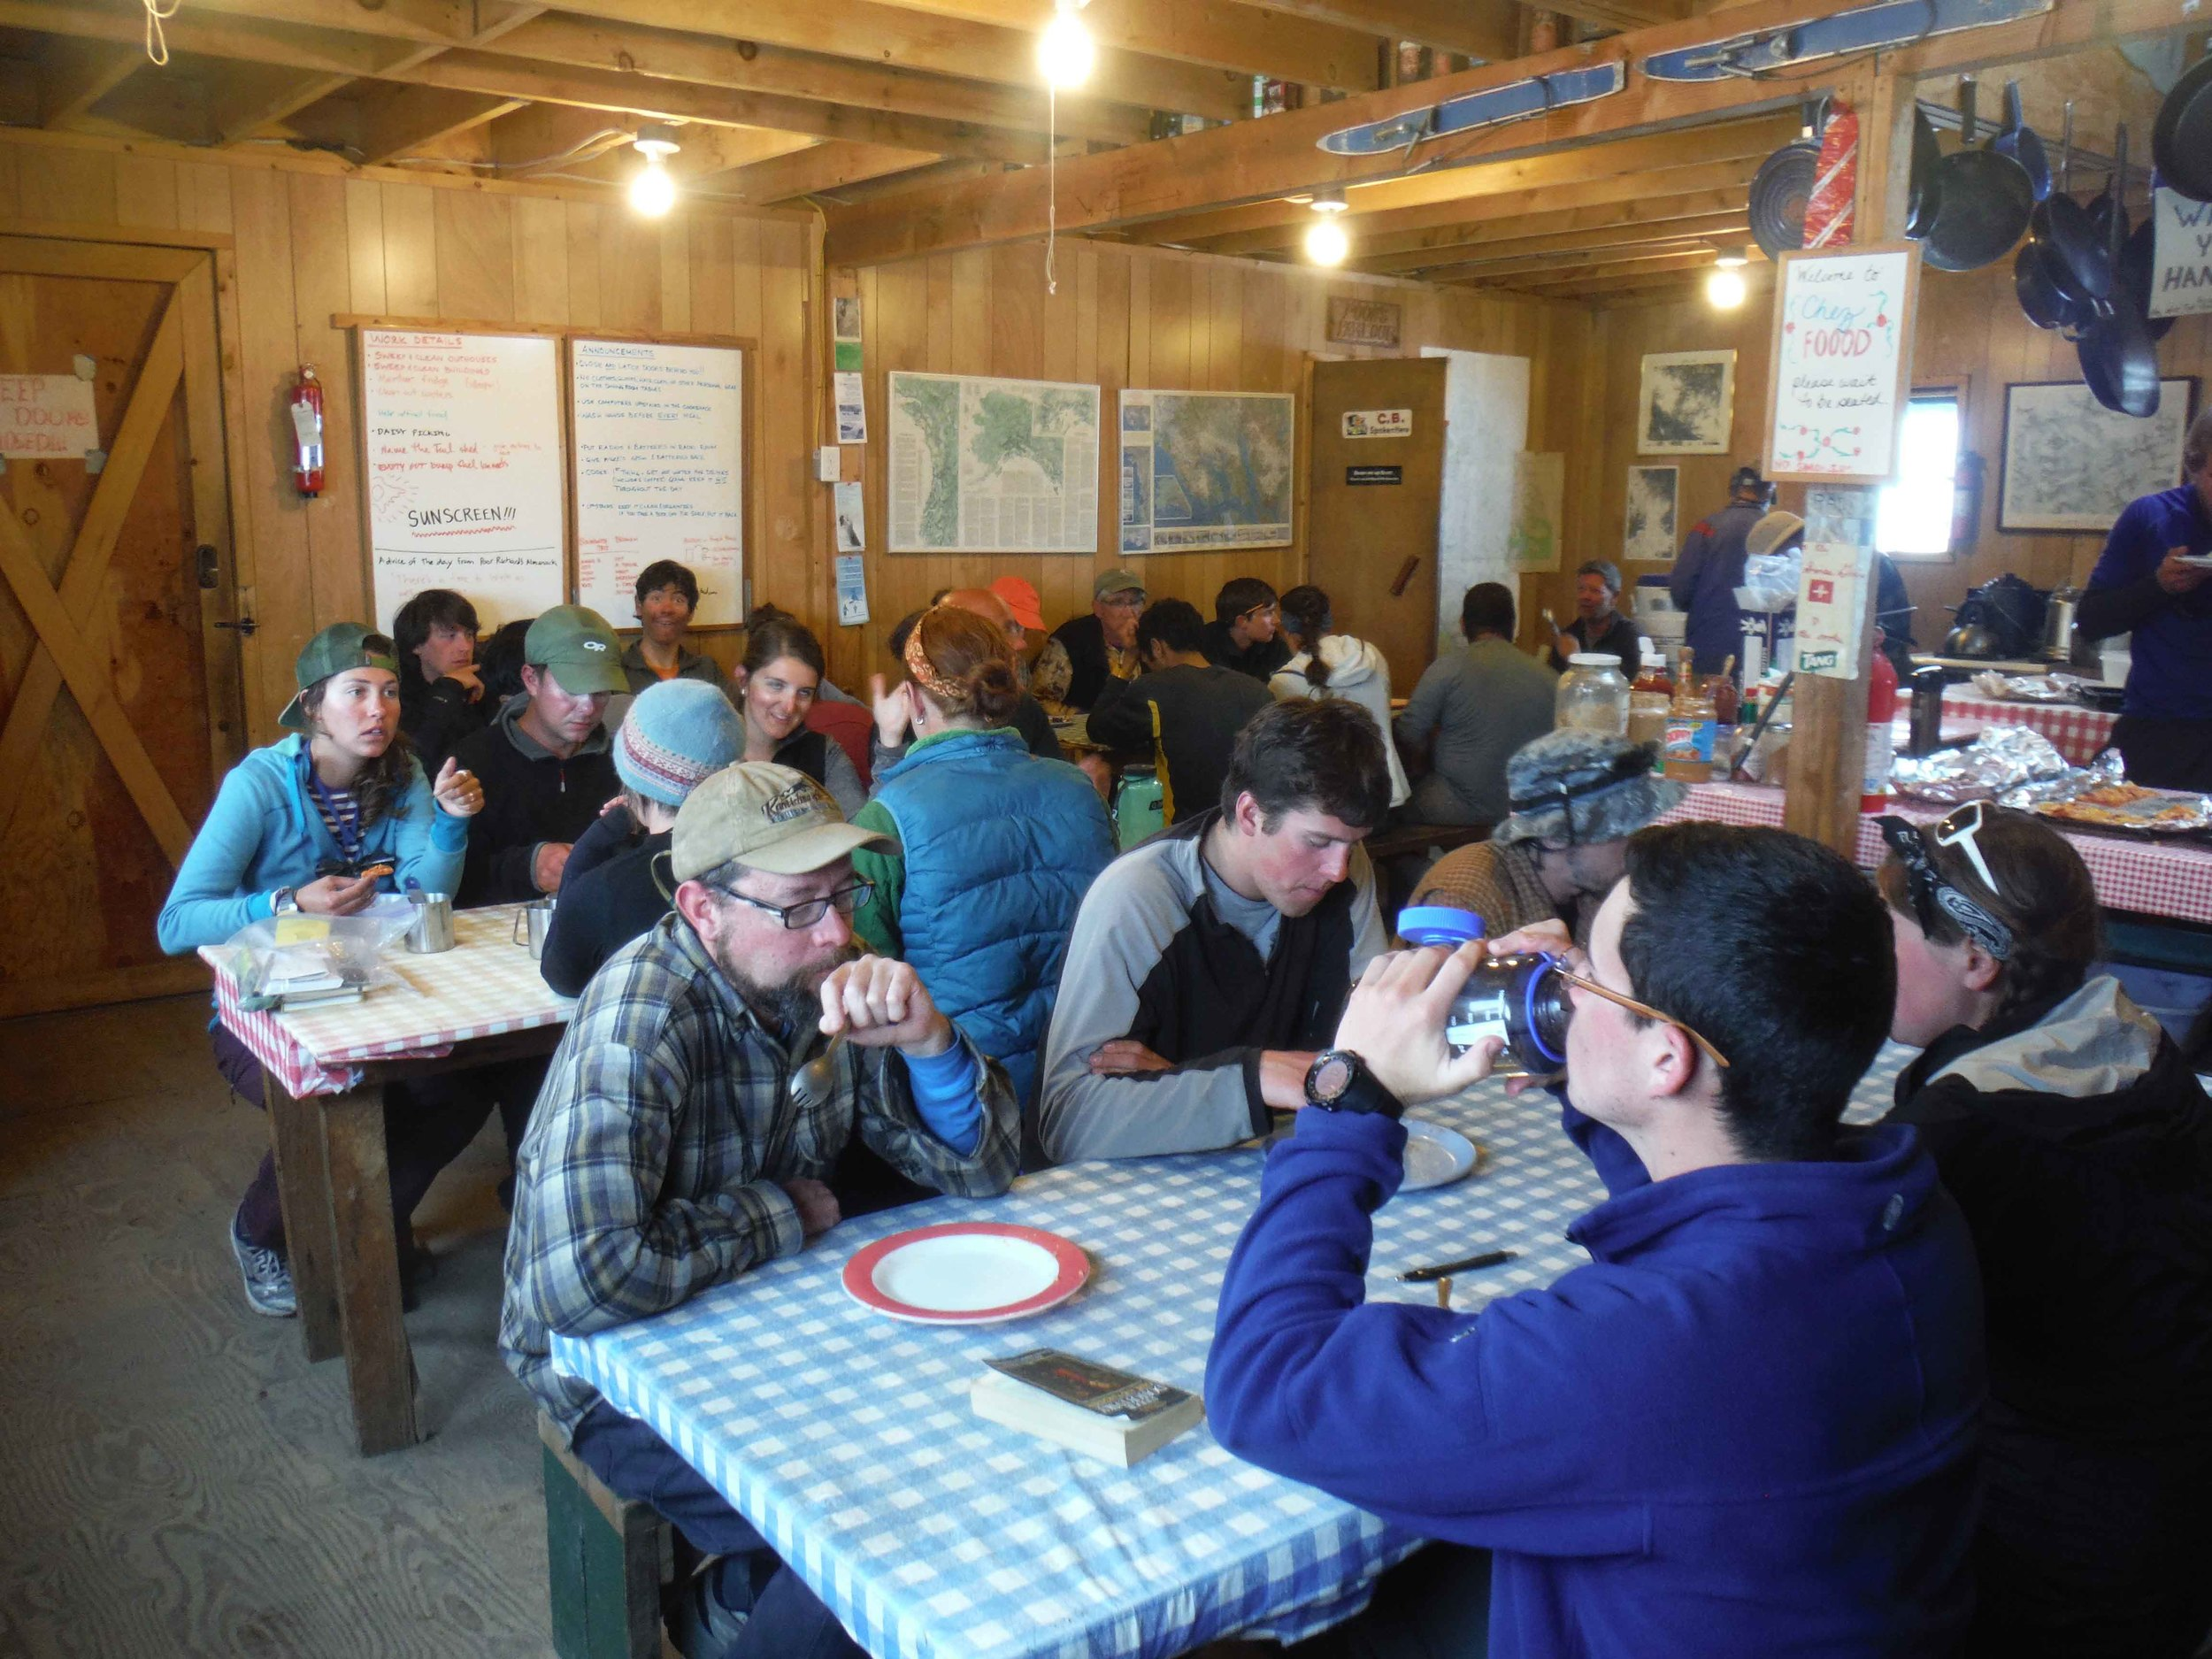 Hungry JIRPers enjoying another fantastic meal at Camp 10. Photo by Sarah Bouckoms